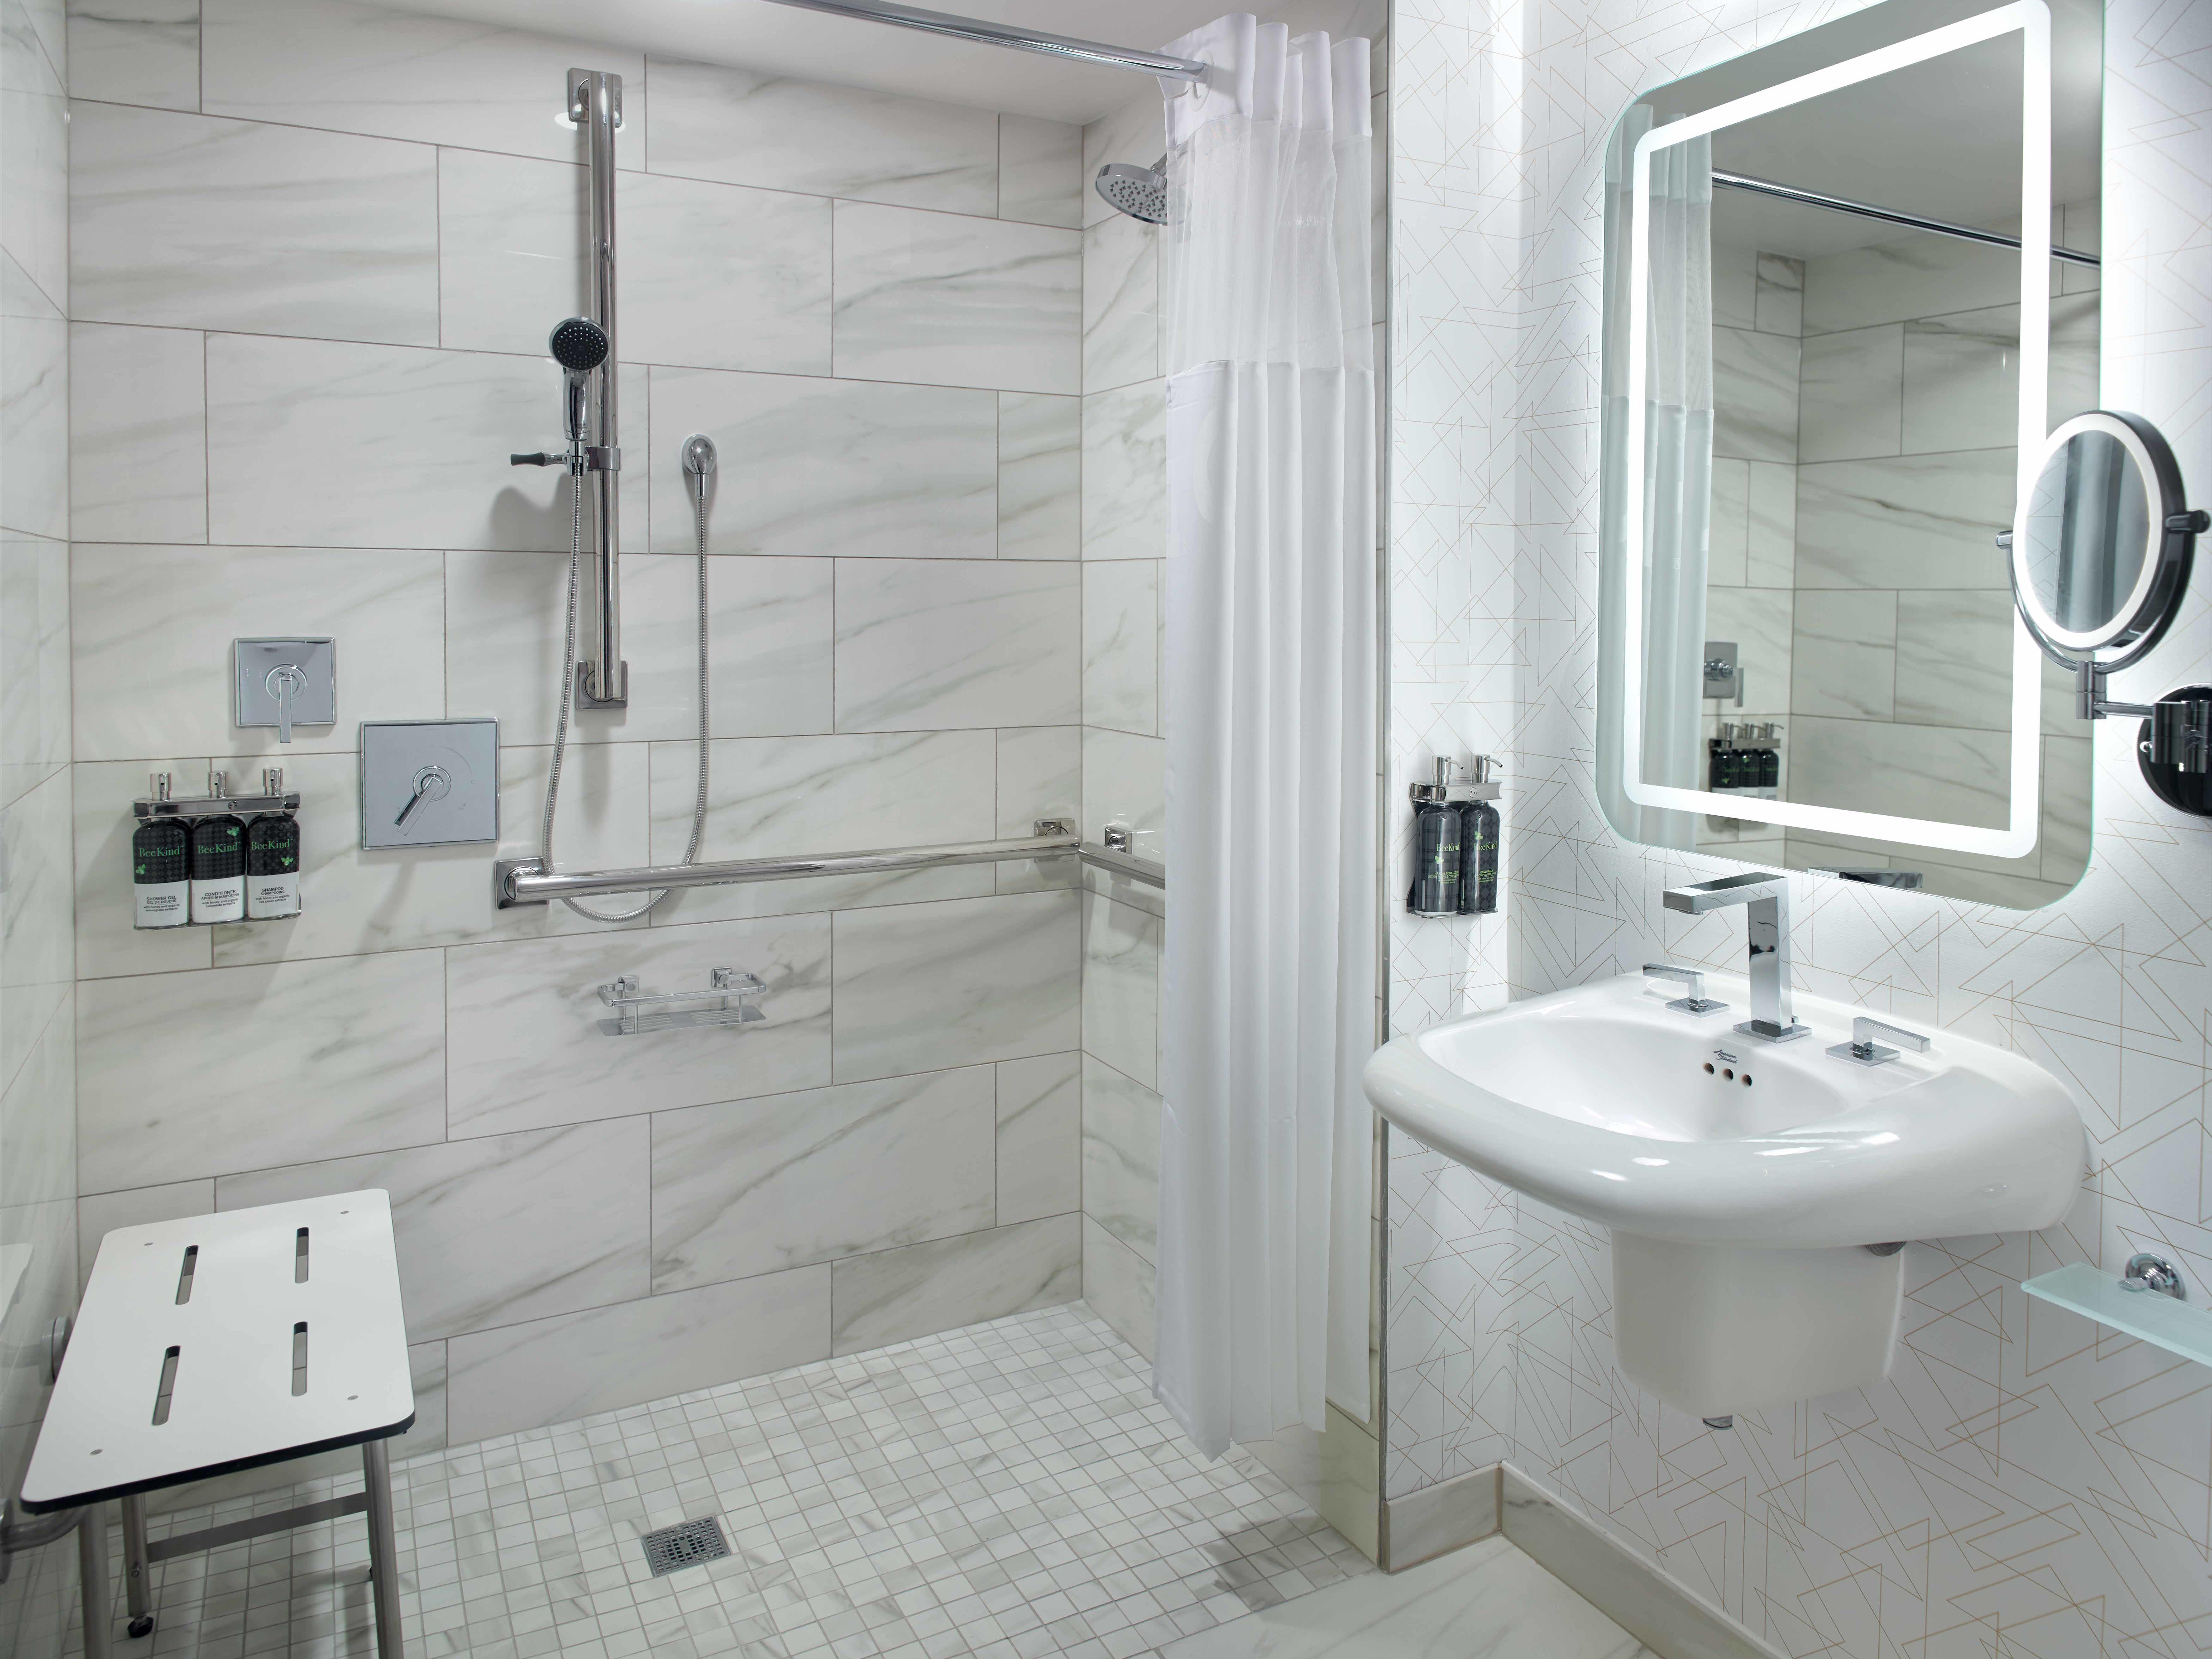 Georgia Tech Hotel Accessible Bathroom - Roll In Shower